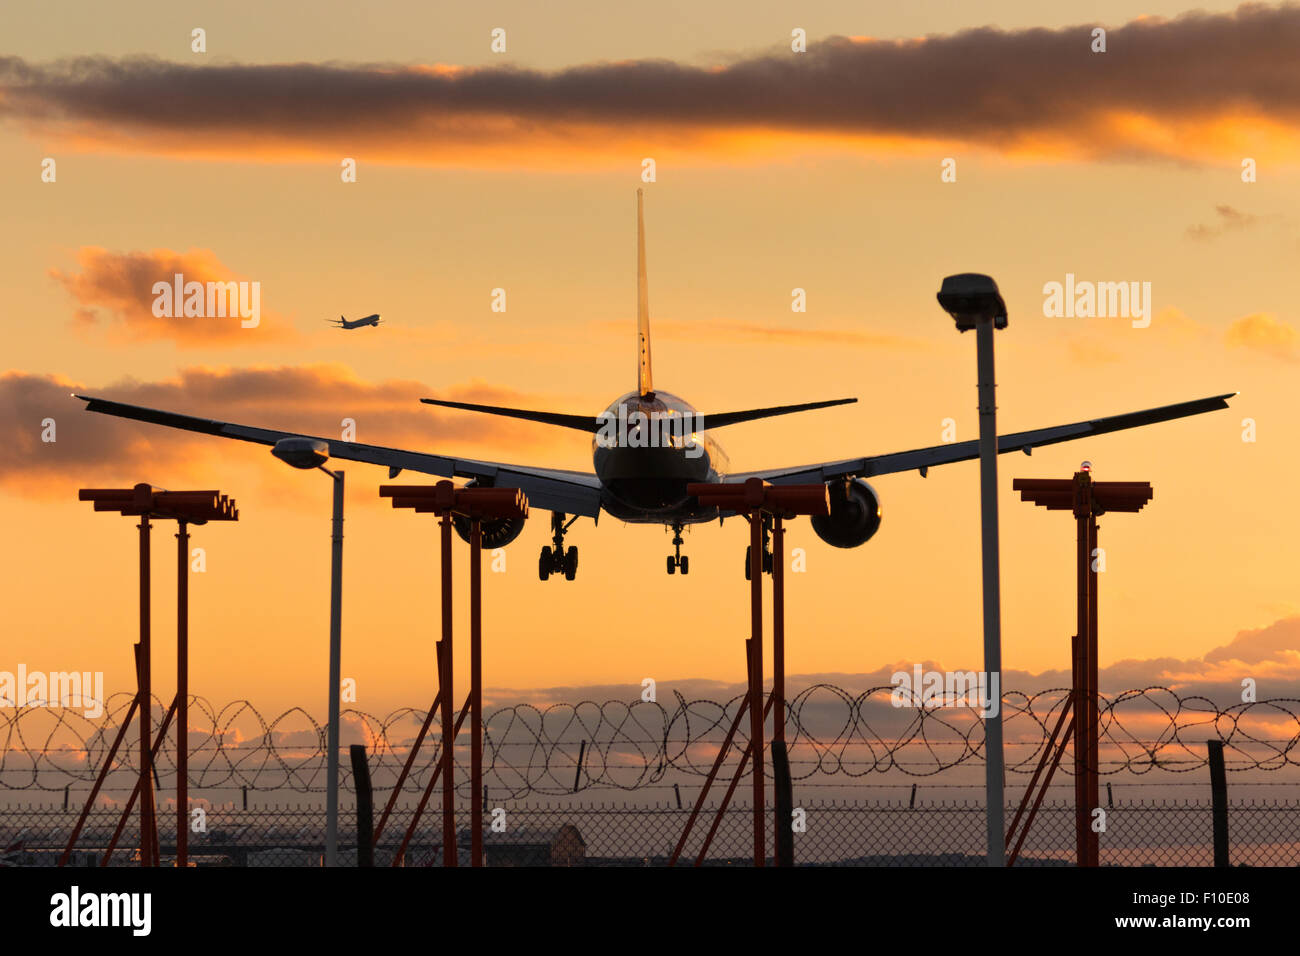 Un British Airways Boeing 777-200 ER Reg. G-VILL terre su Londra Heathrow la pista 27R. Immagini Stock